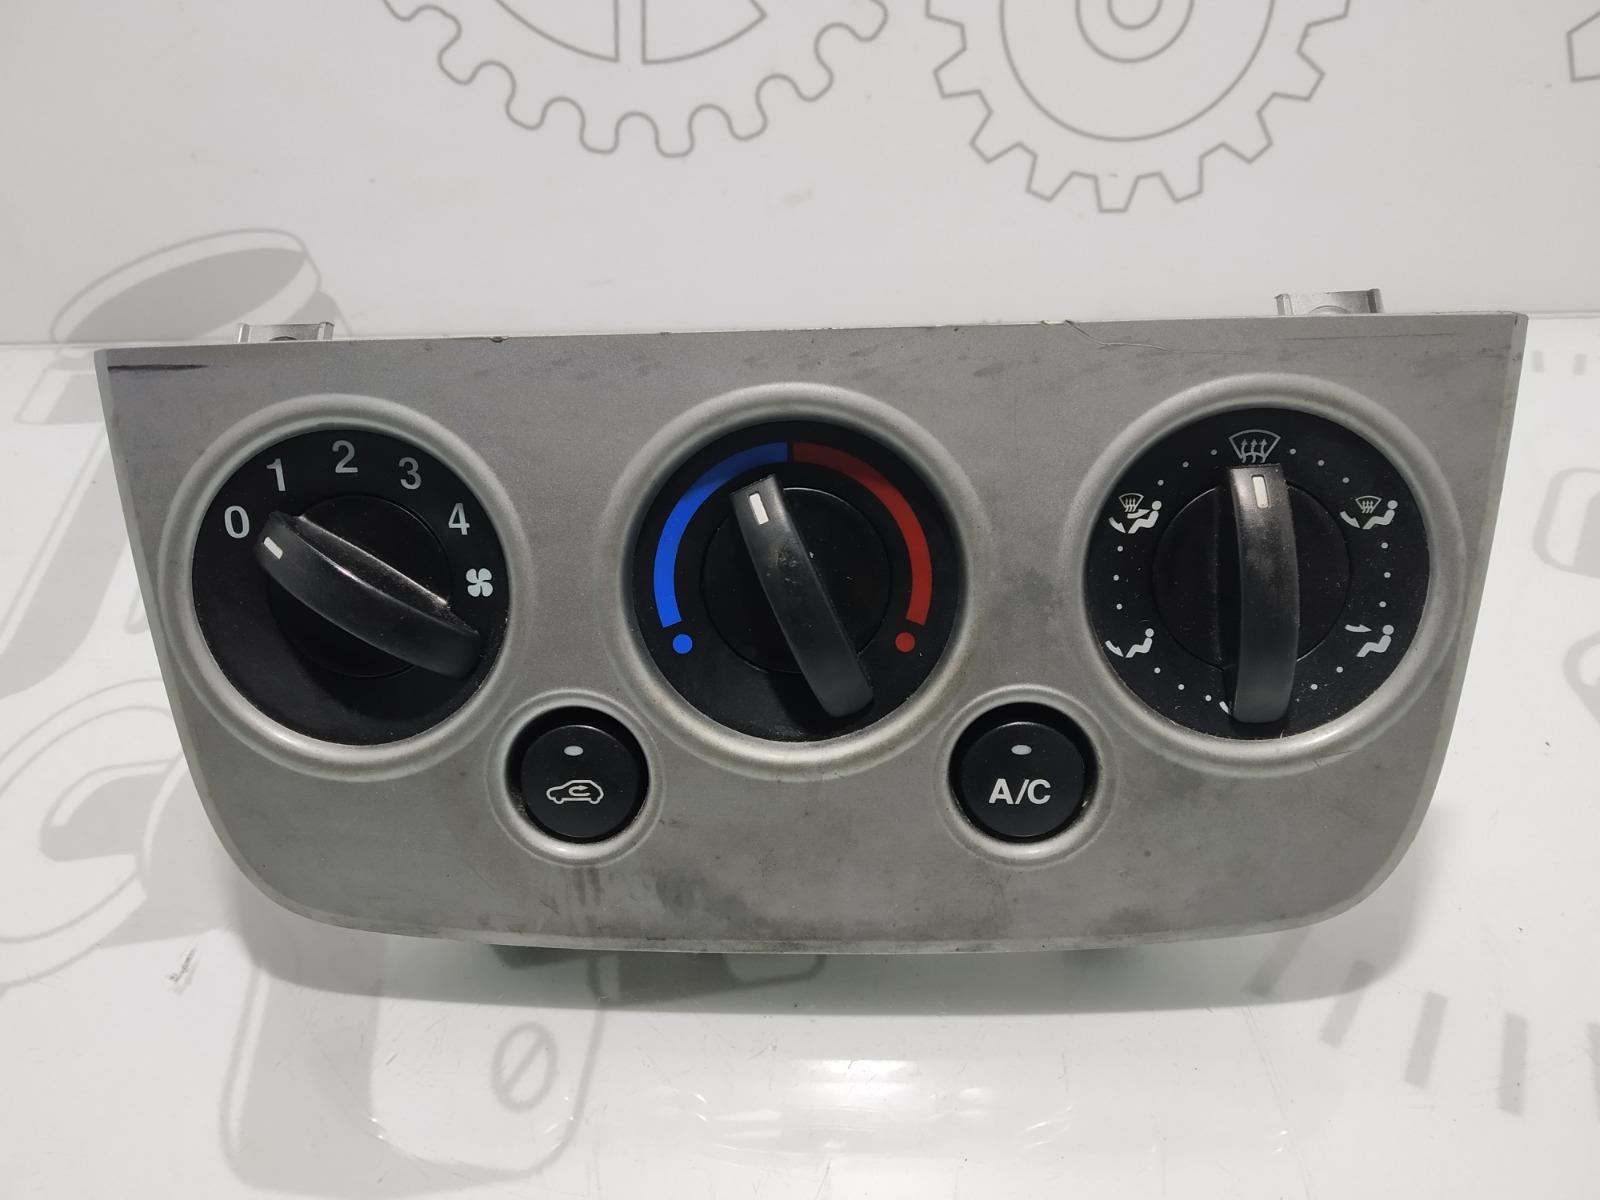 Блок управления печки/климат-контроля Ford Fiesta 1.4 CDTI 2007 (б/у)